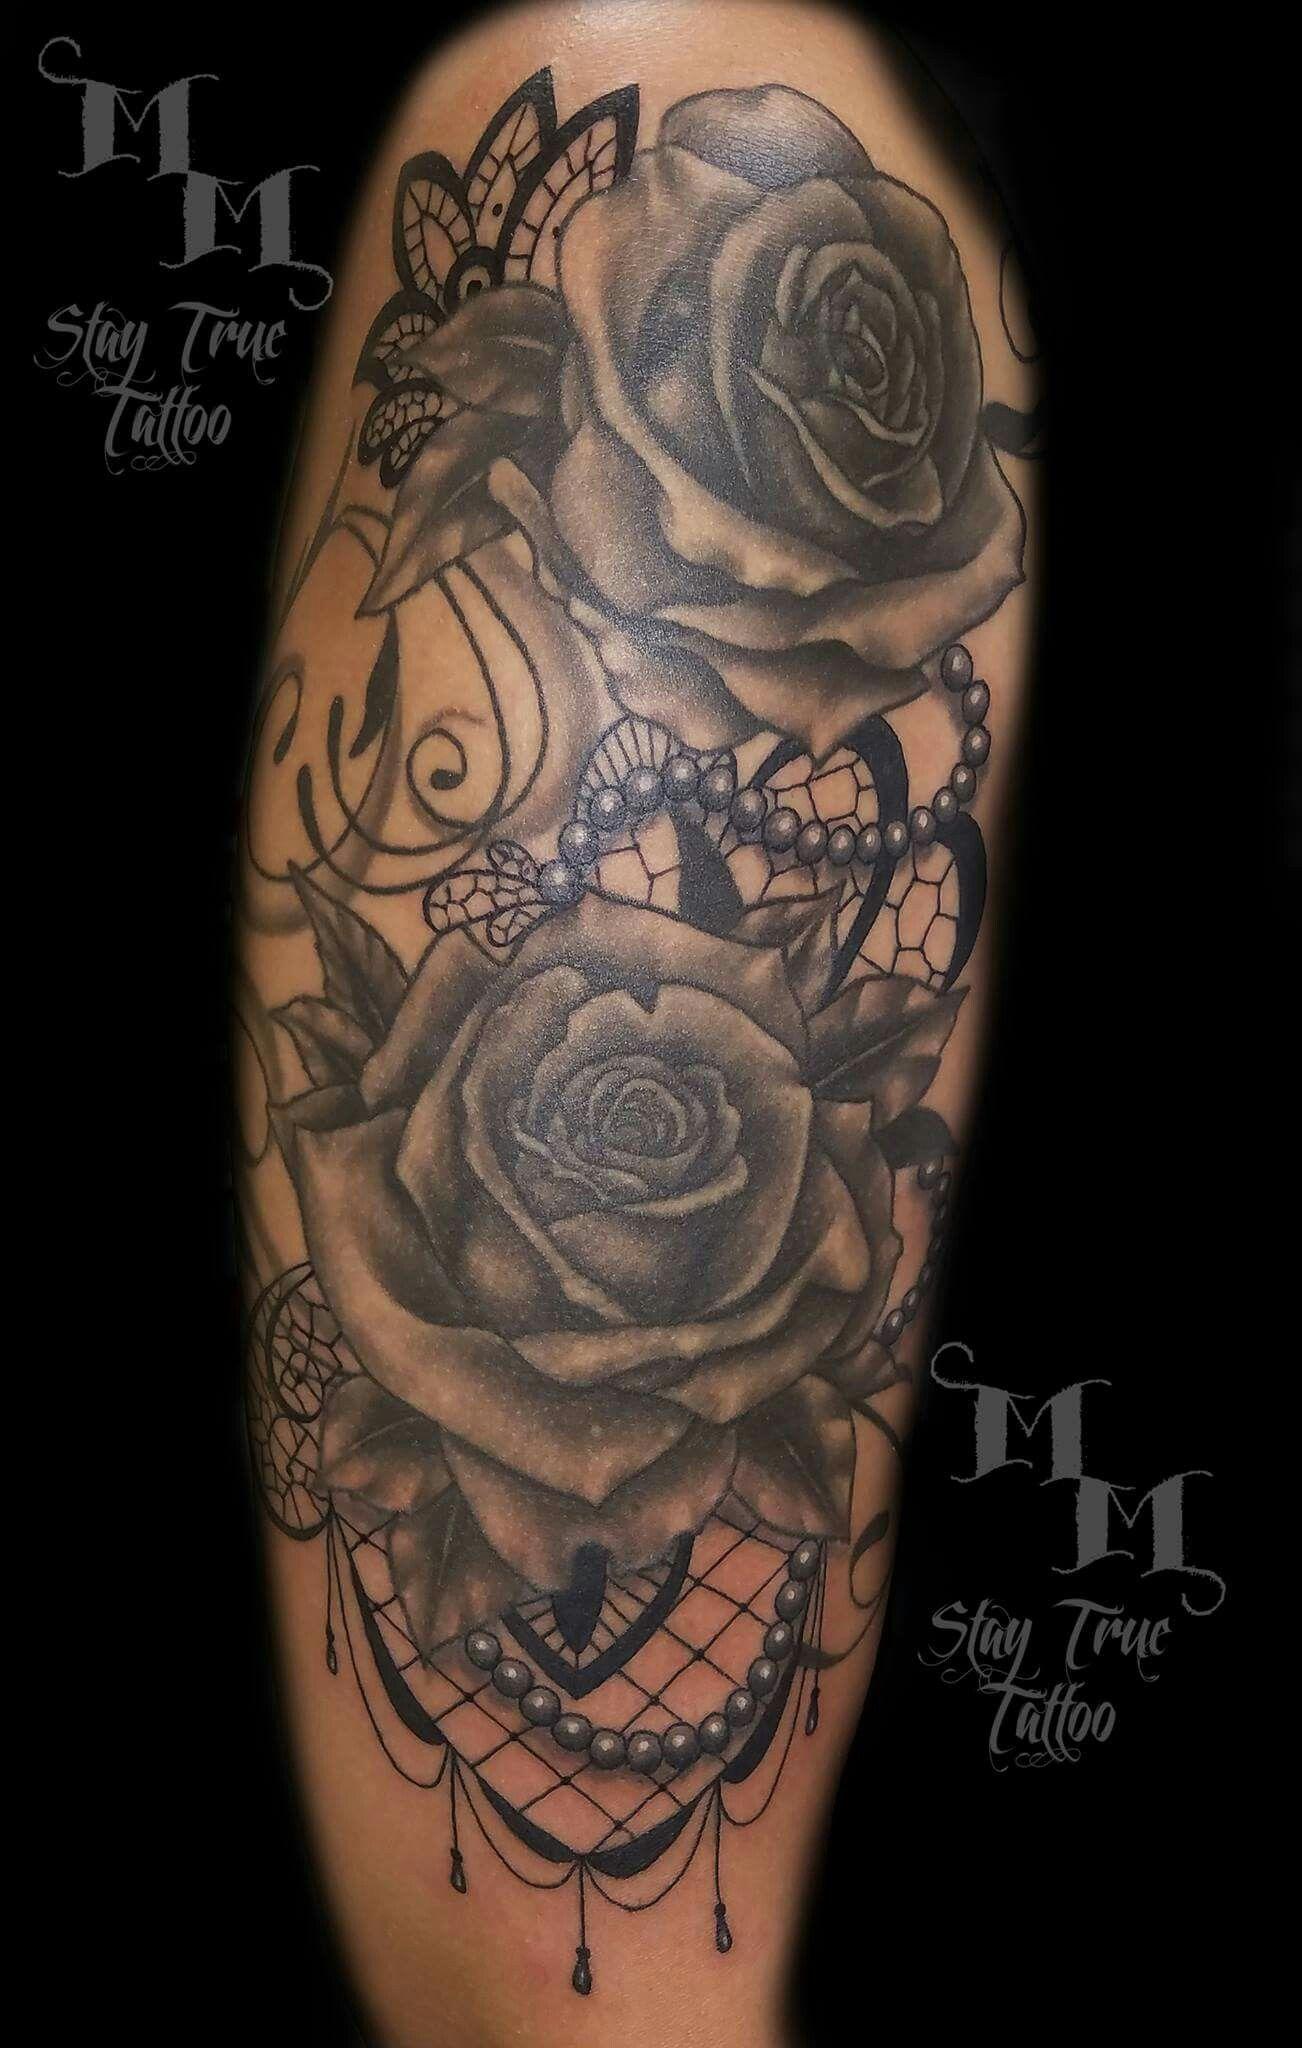 roses w pearls lace tattoo tattoo ideas pinterest pearls tattoo and lace tattoo. Black Bedroom Furniture Sets. Home Design Ideas